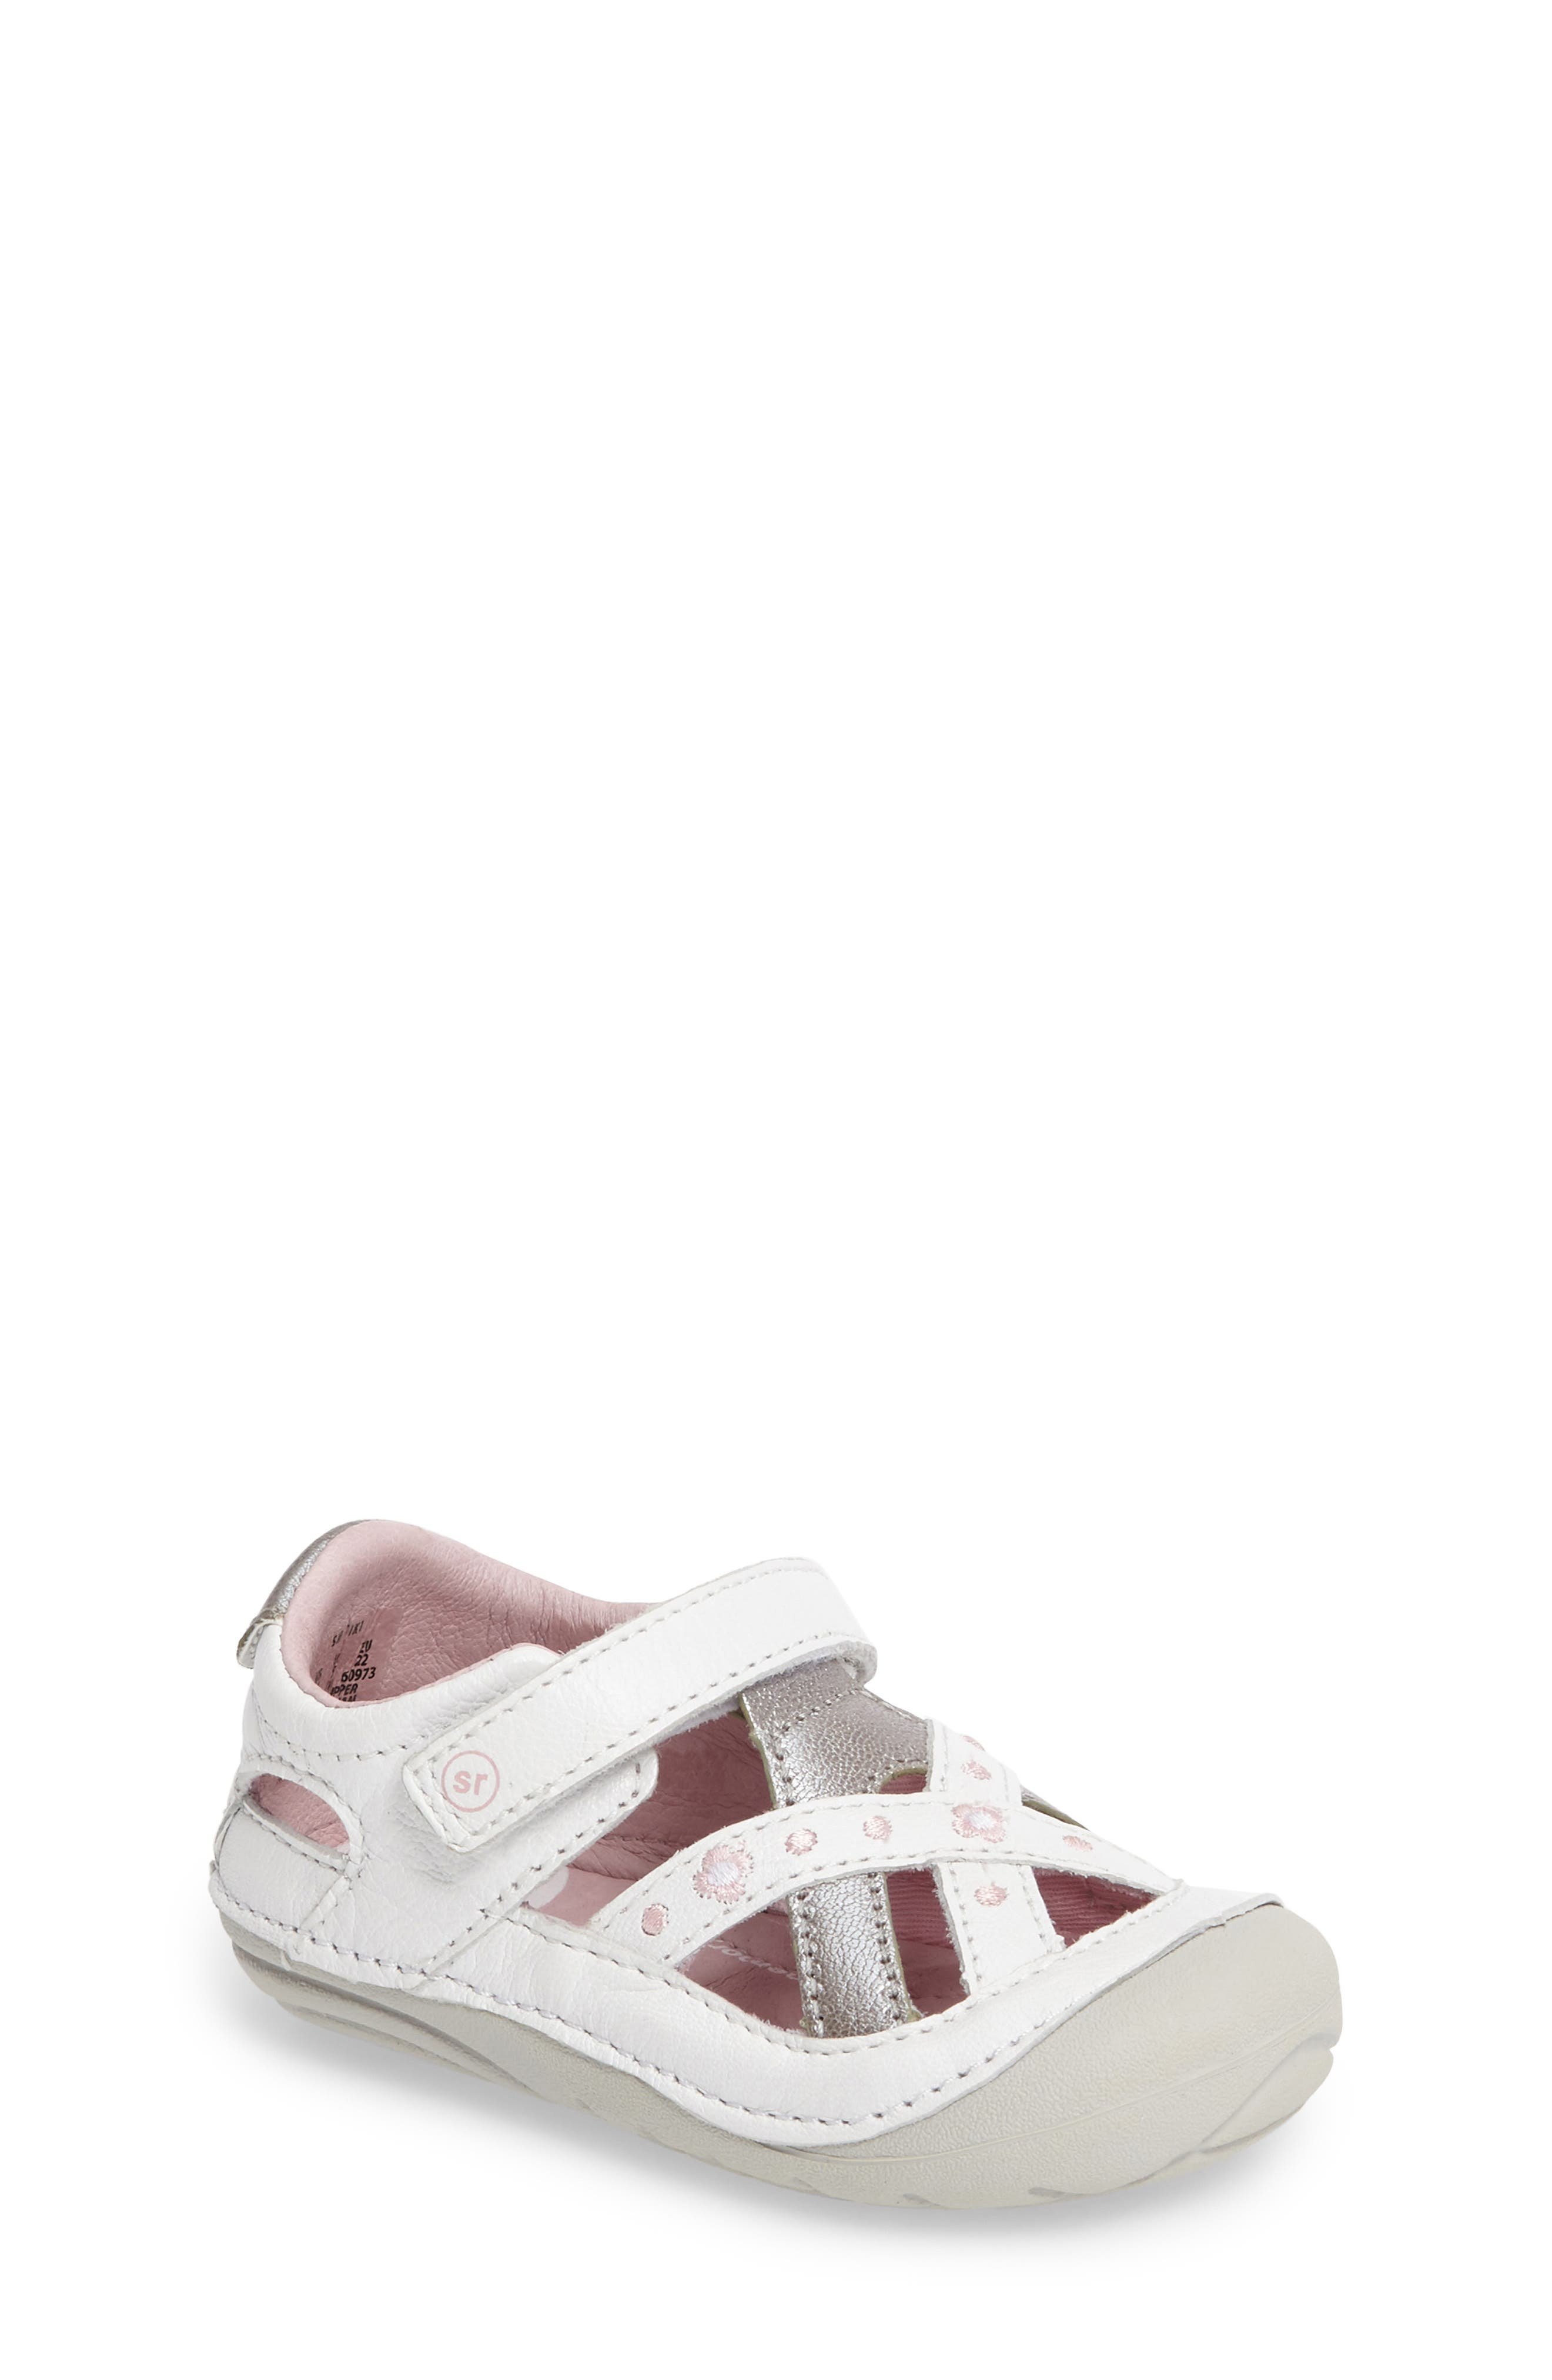 STRIDE RITE,                             Kiki Embroidered Sneaker,                             Main thumbnail 1, color,                             WHITE